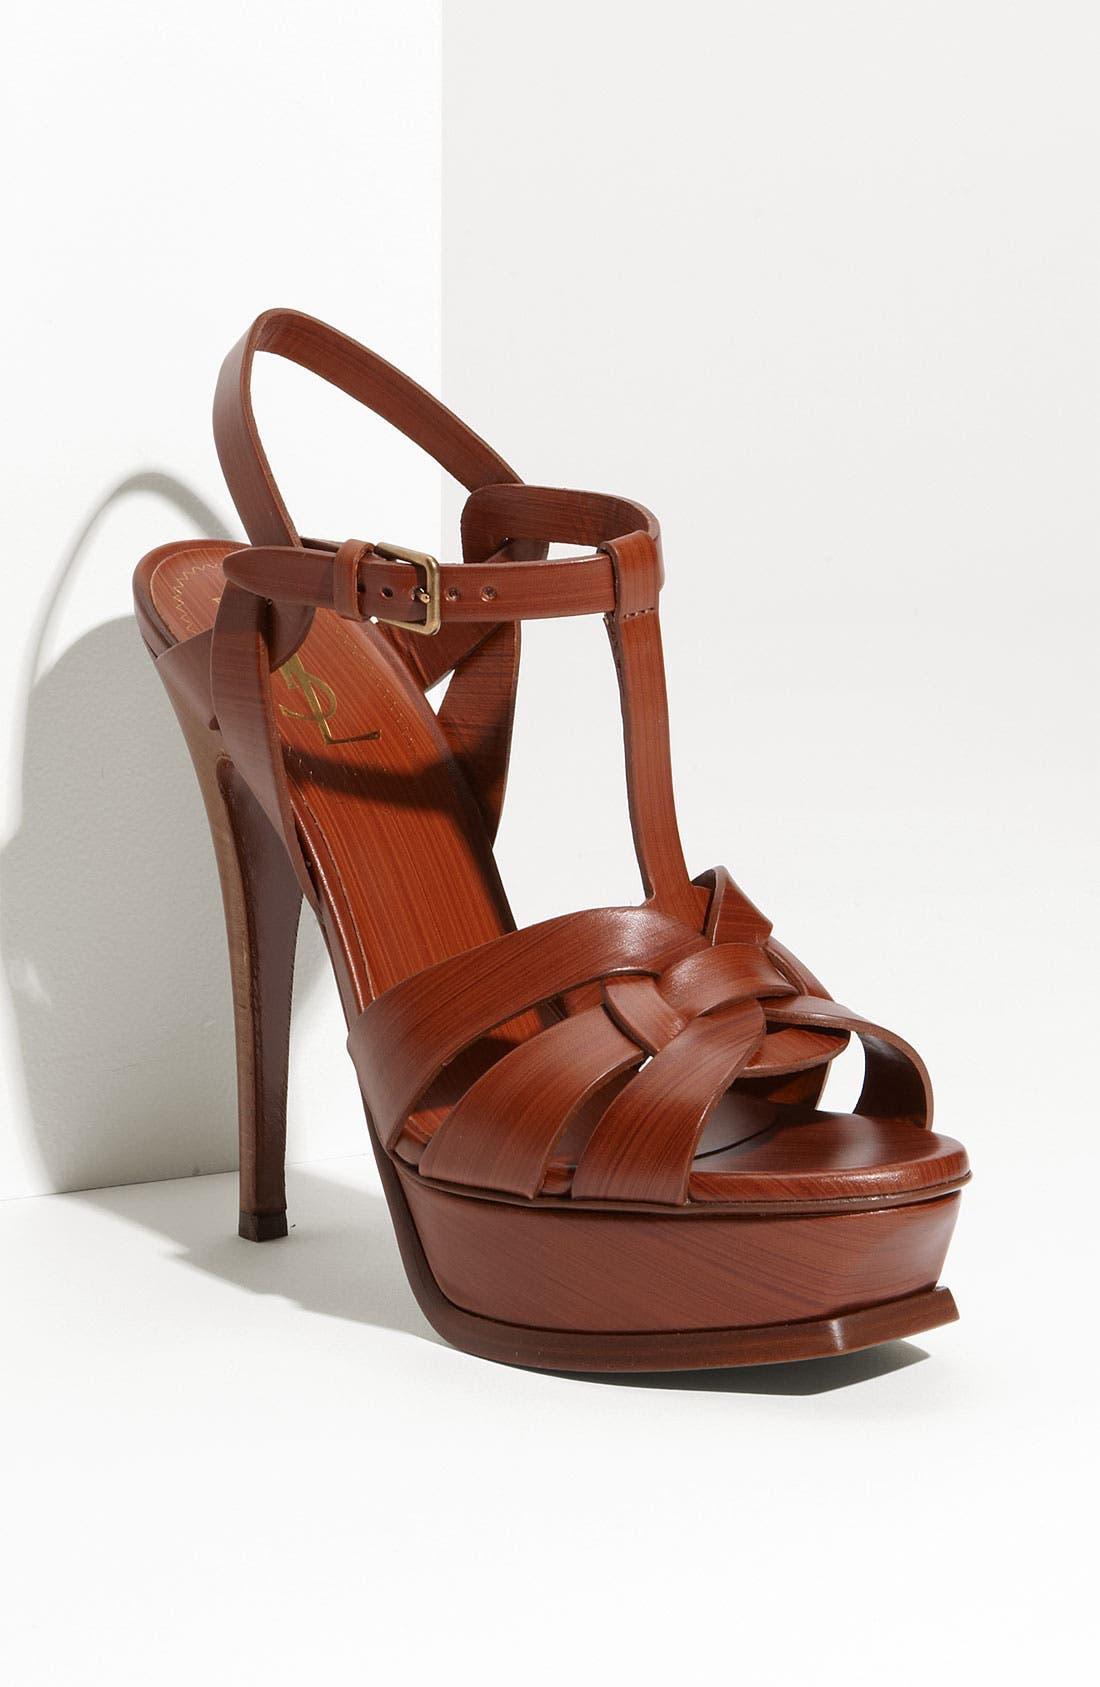 Alternate Image 1 Selected - Yves Saint Laurent 'Tribute' Platform Sandal